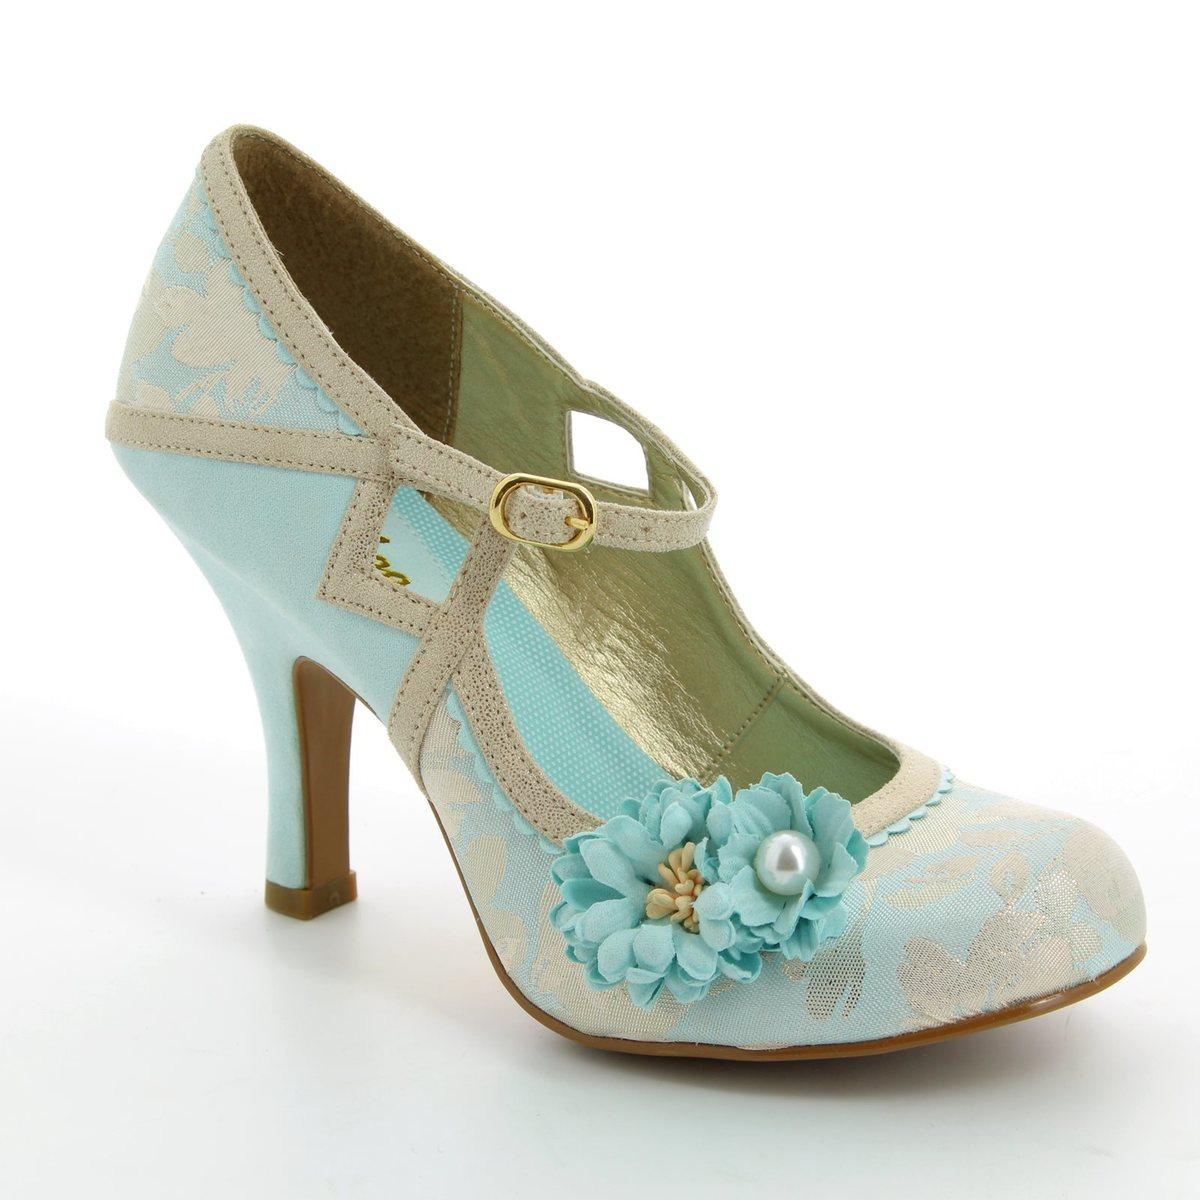 Ruby Shoo High-heeled Shoes - Pale blue - 09088 70 YASMIN 99fc3565150f